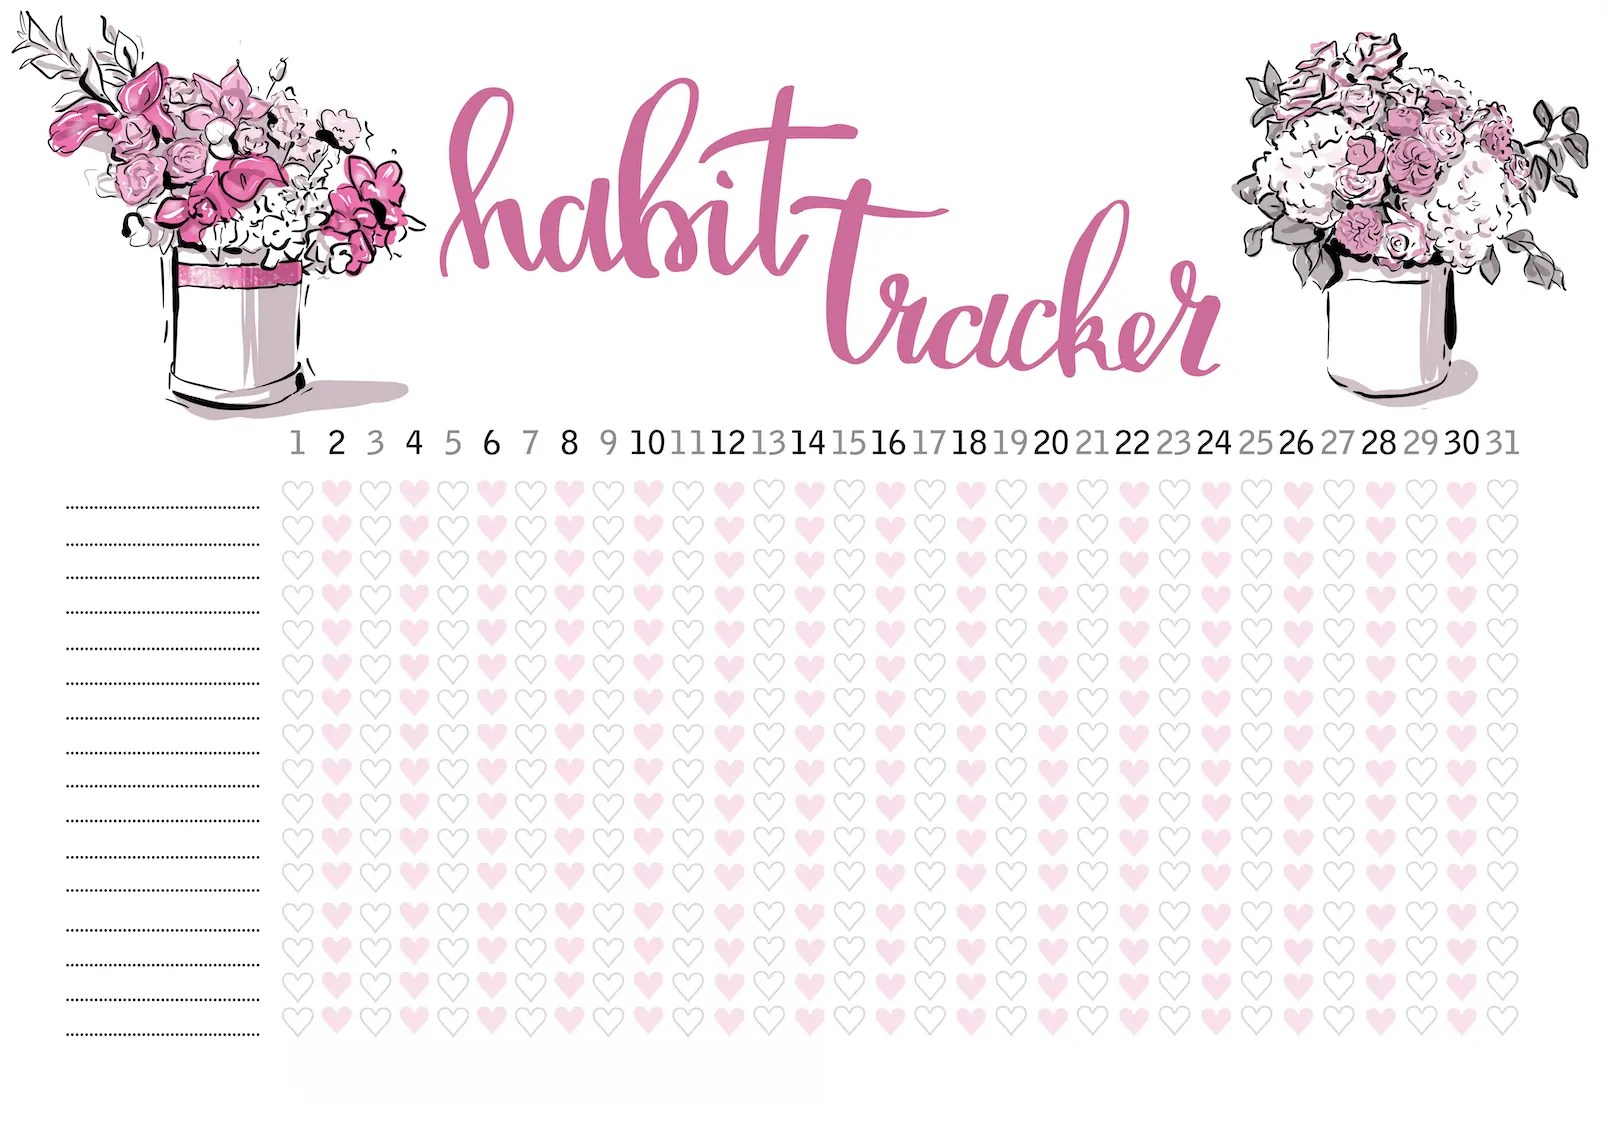 habit tracker 5